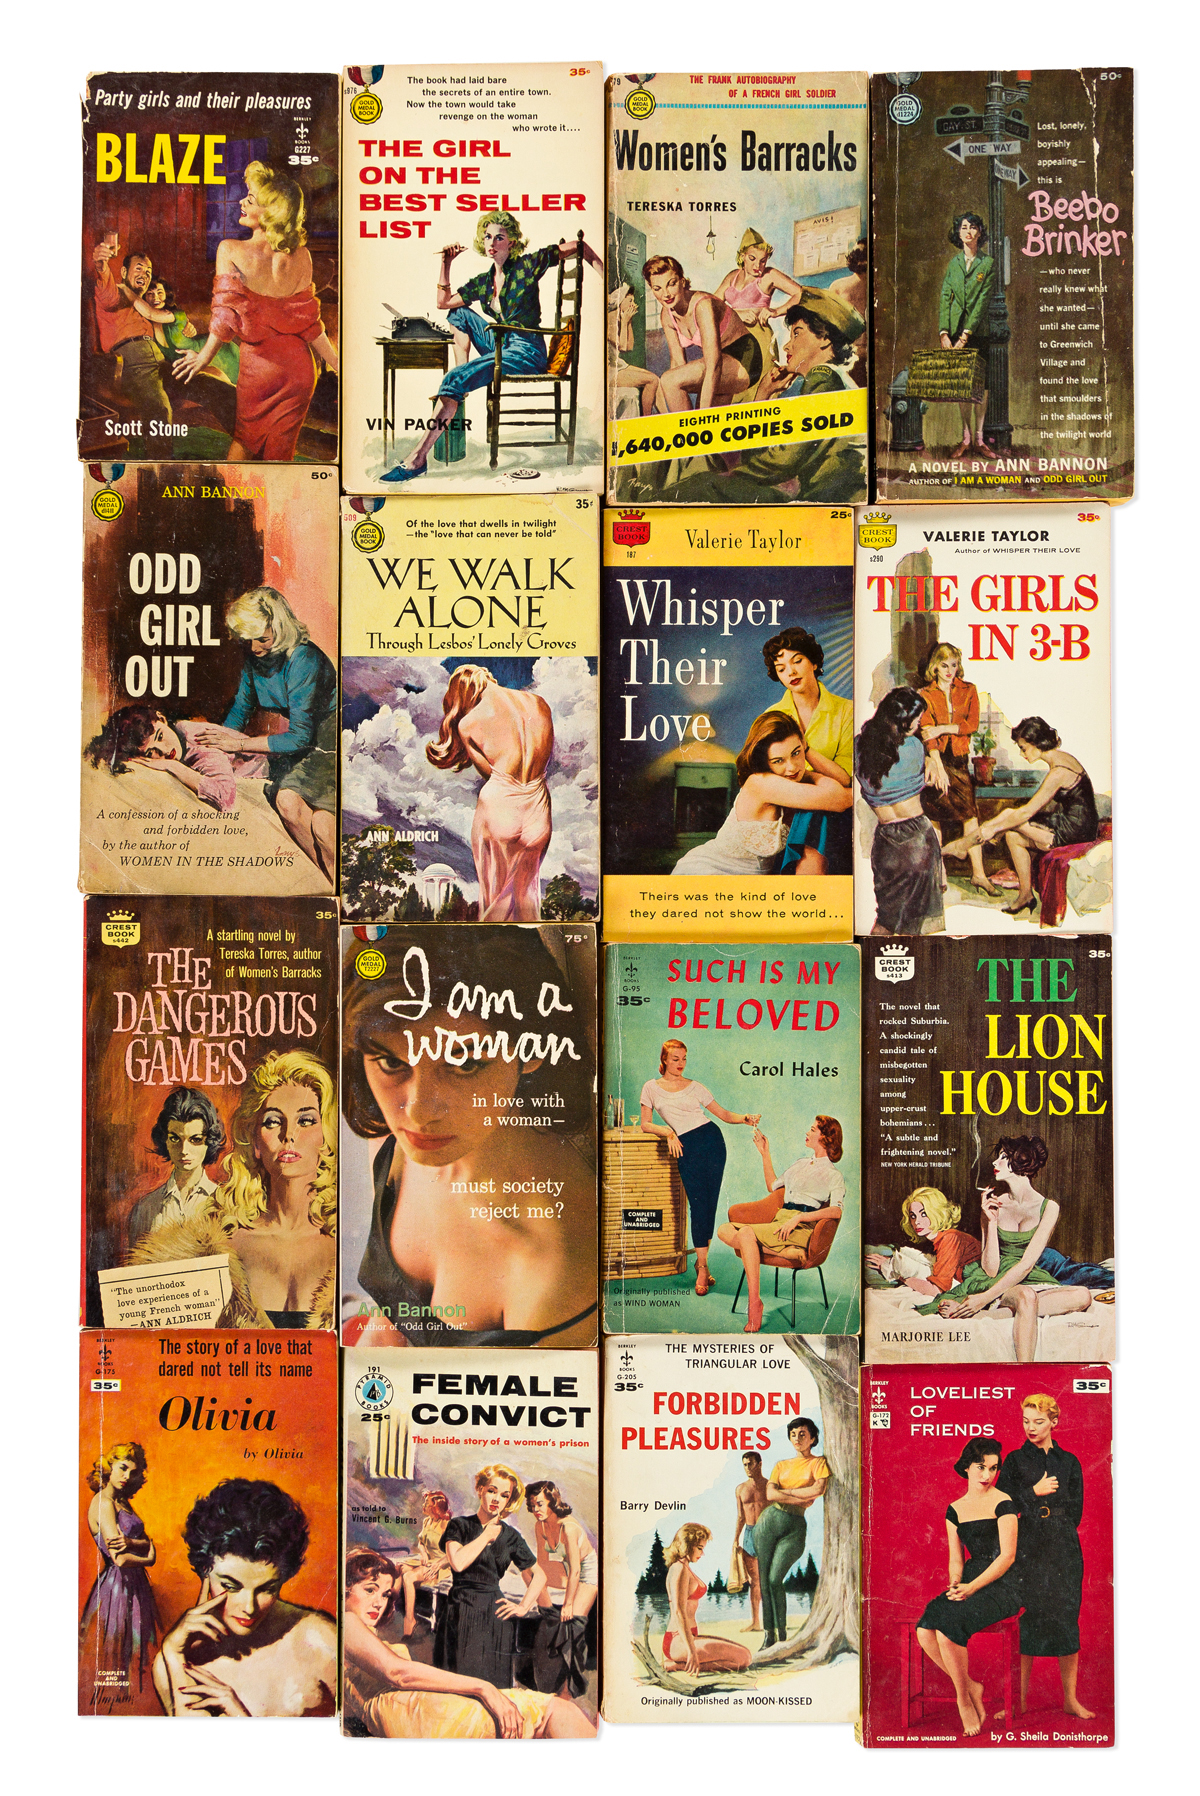 VARIOUS AUTHORS- VARIOUS ARTISTS Lesbian Pulp Fiction.